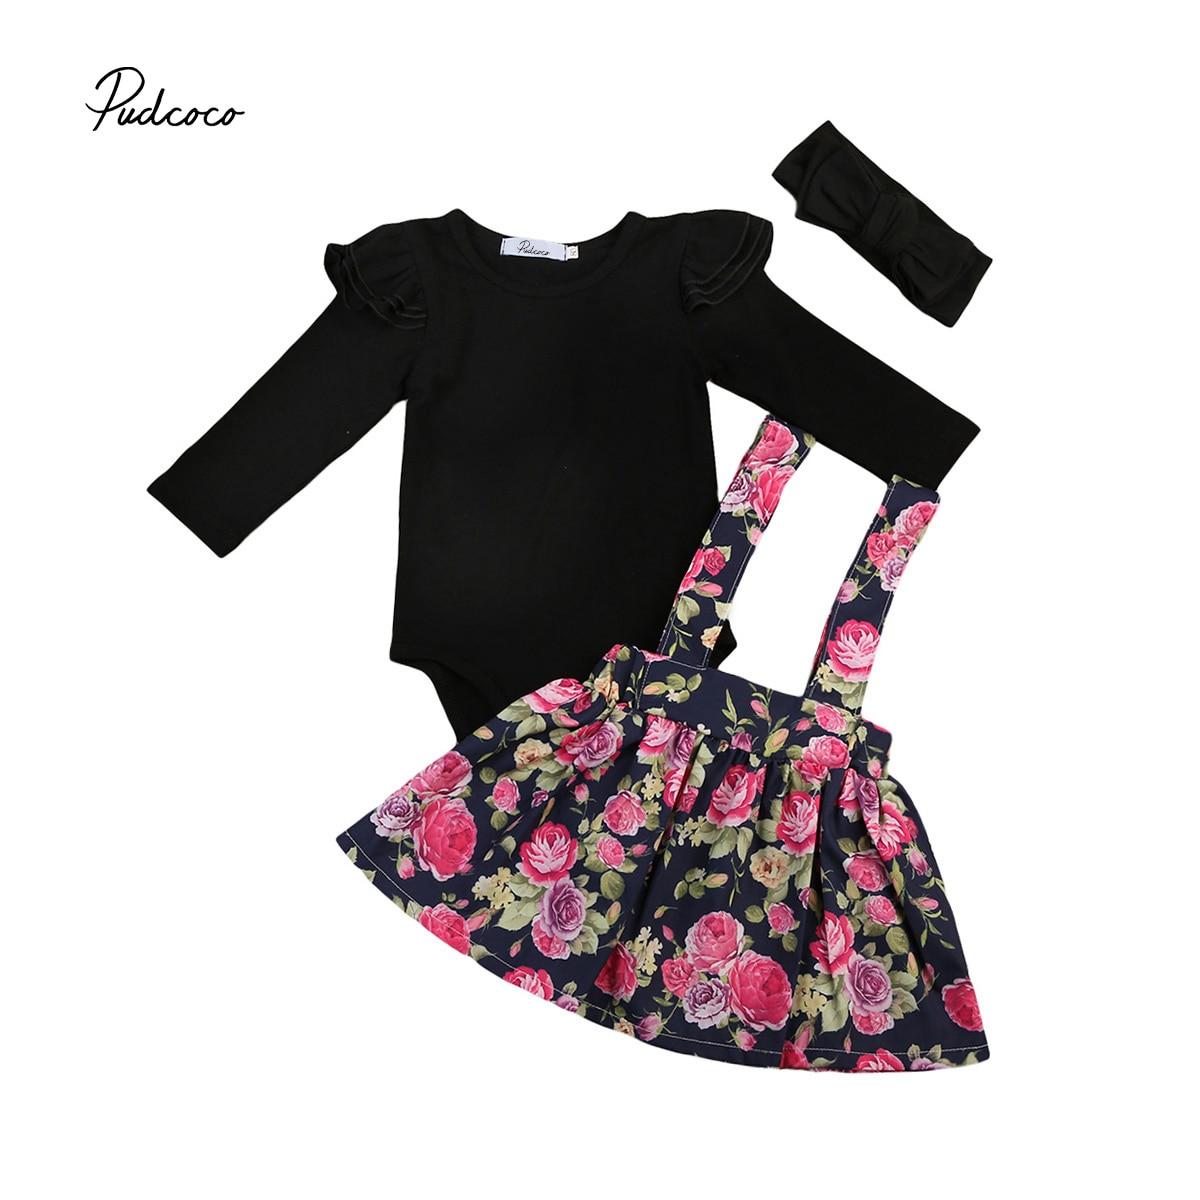 adorable baby girl clothes set 3pcs 0 24m infant girl